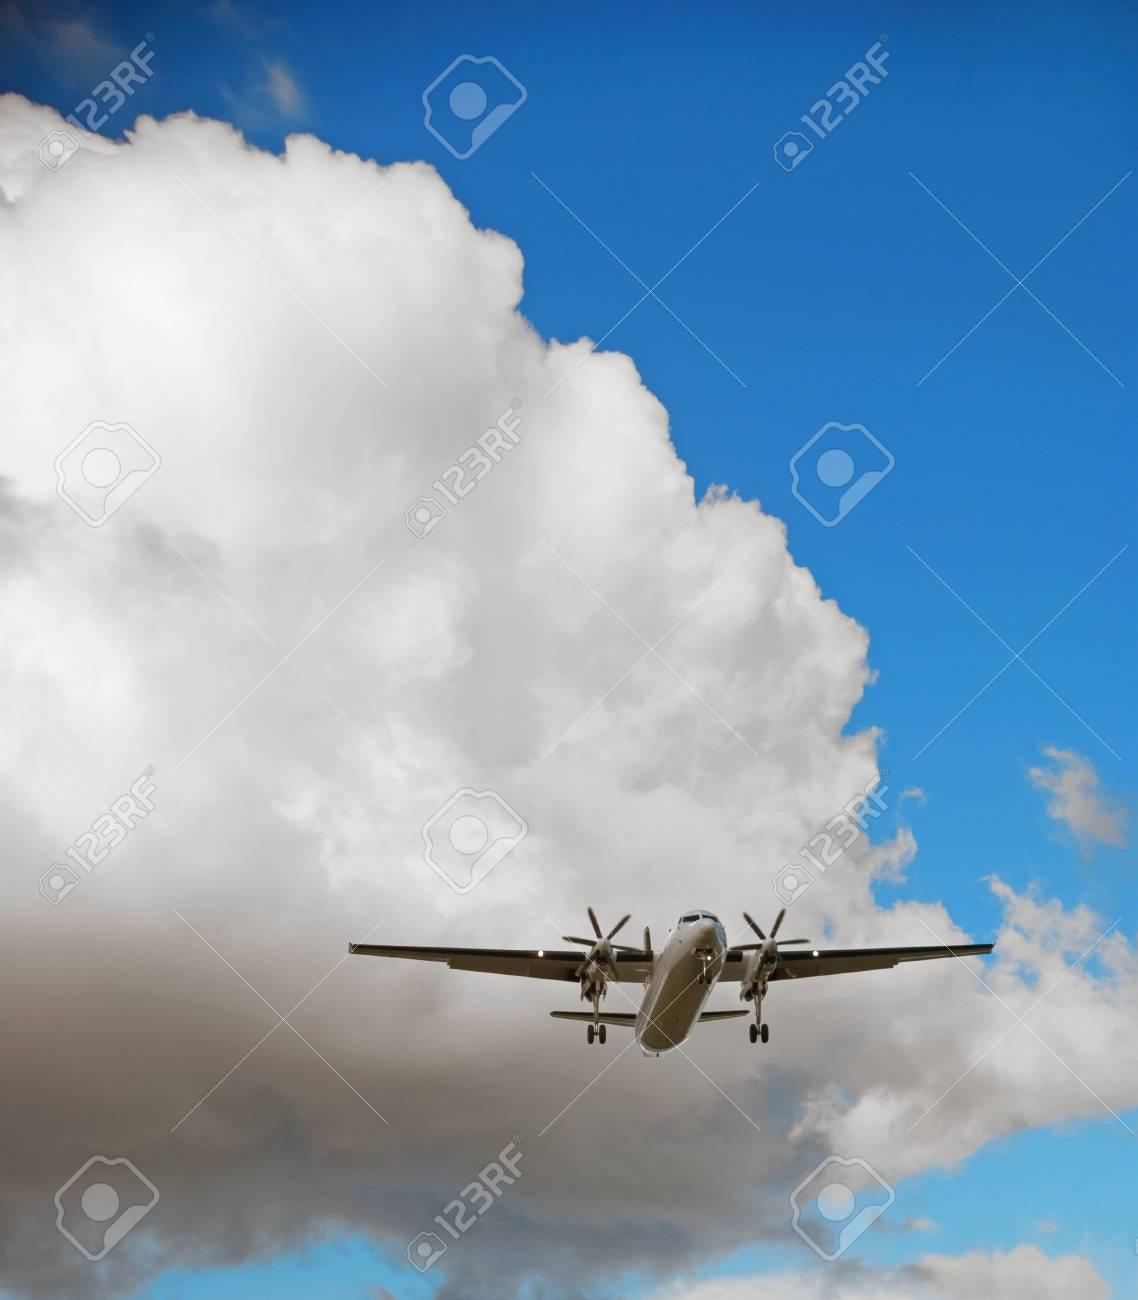 Propeller passenger aircraft taking off on blue sky Stock Photo - 12441167